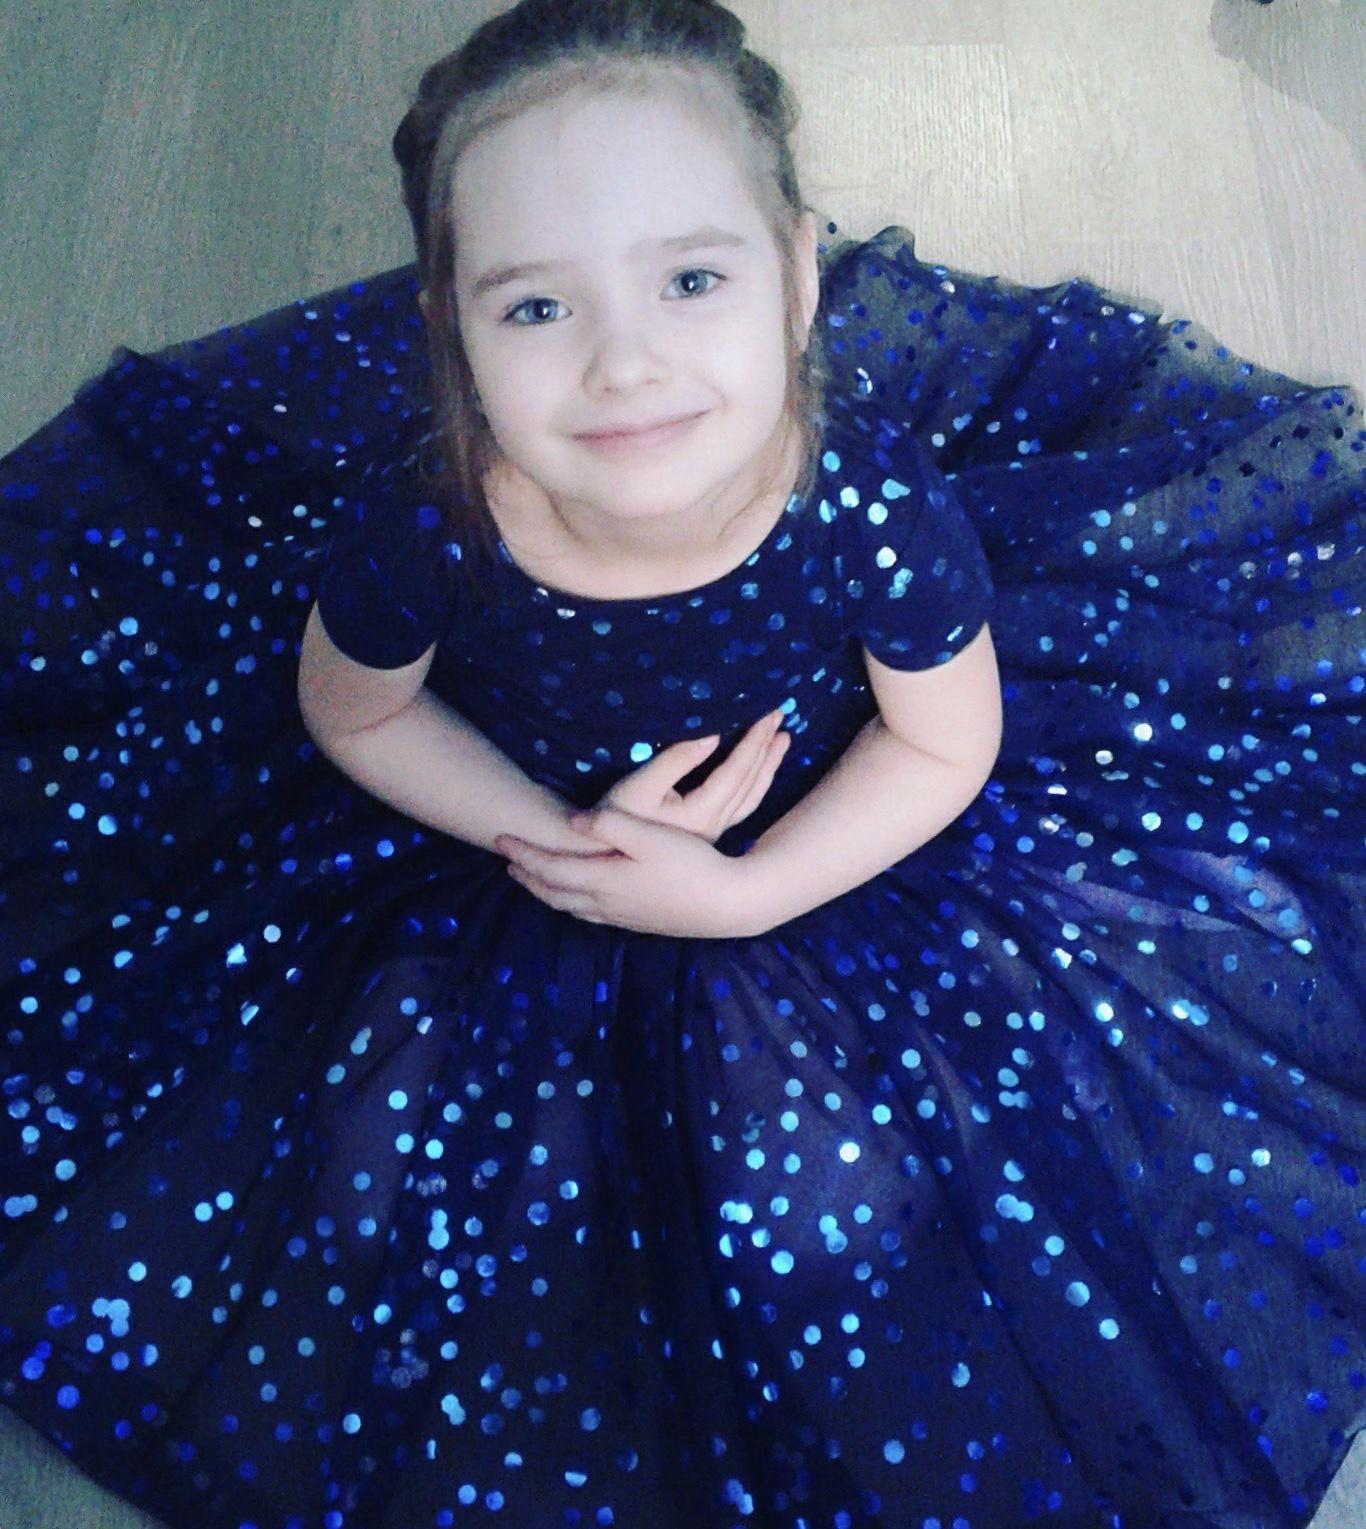 Принцесса-голубоглазка. Принцесса собирается на бал